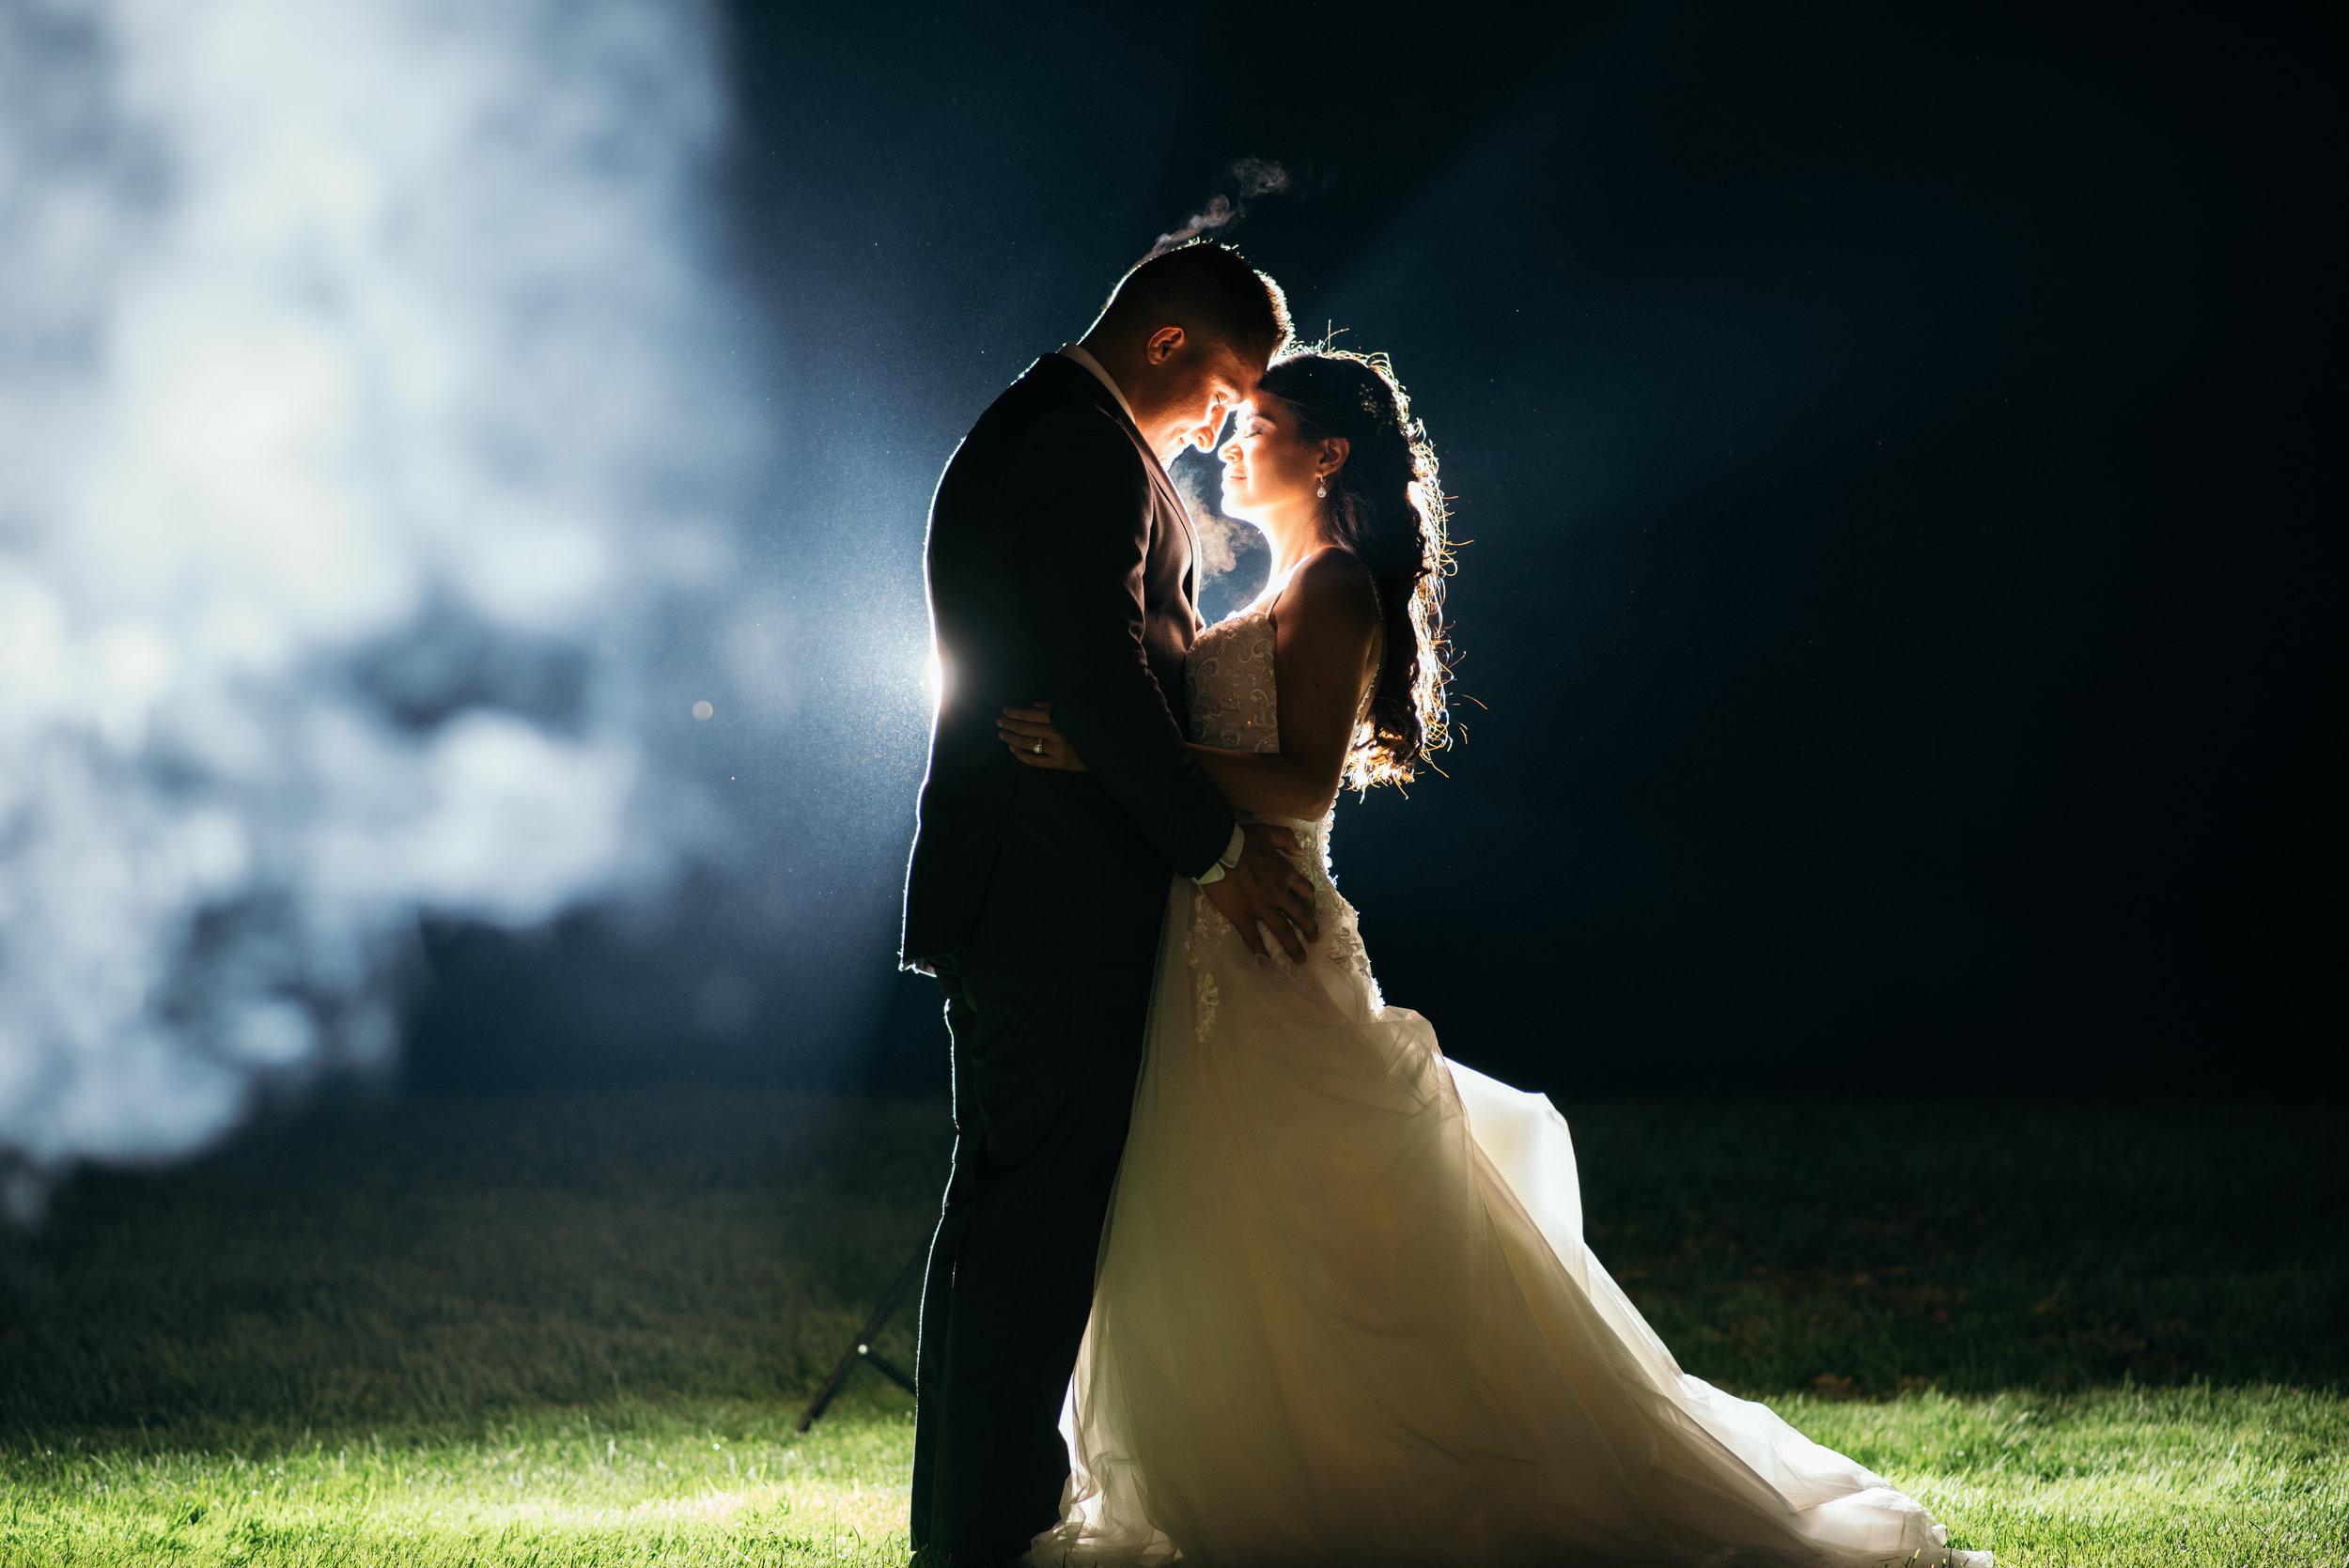 WeddingPhotos | NJPhotographer | Highlights-15-5.jpg